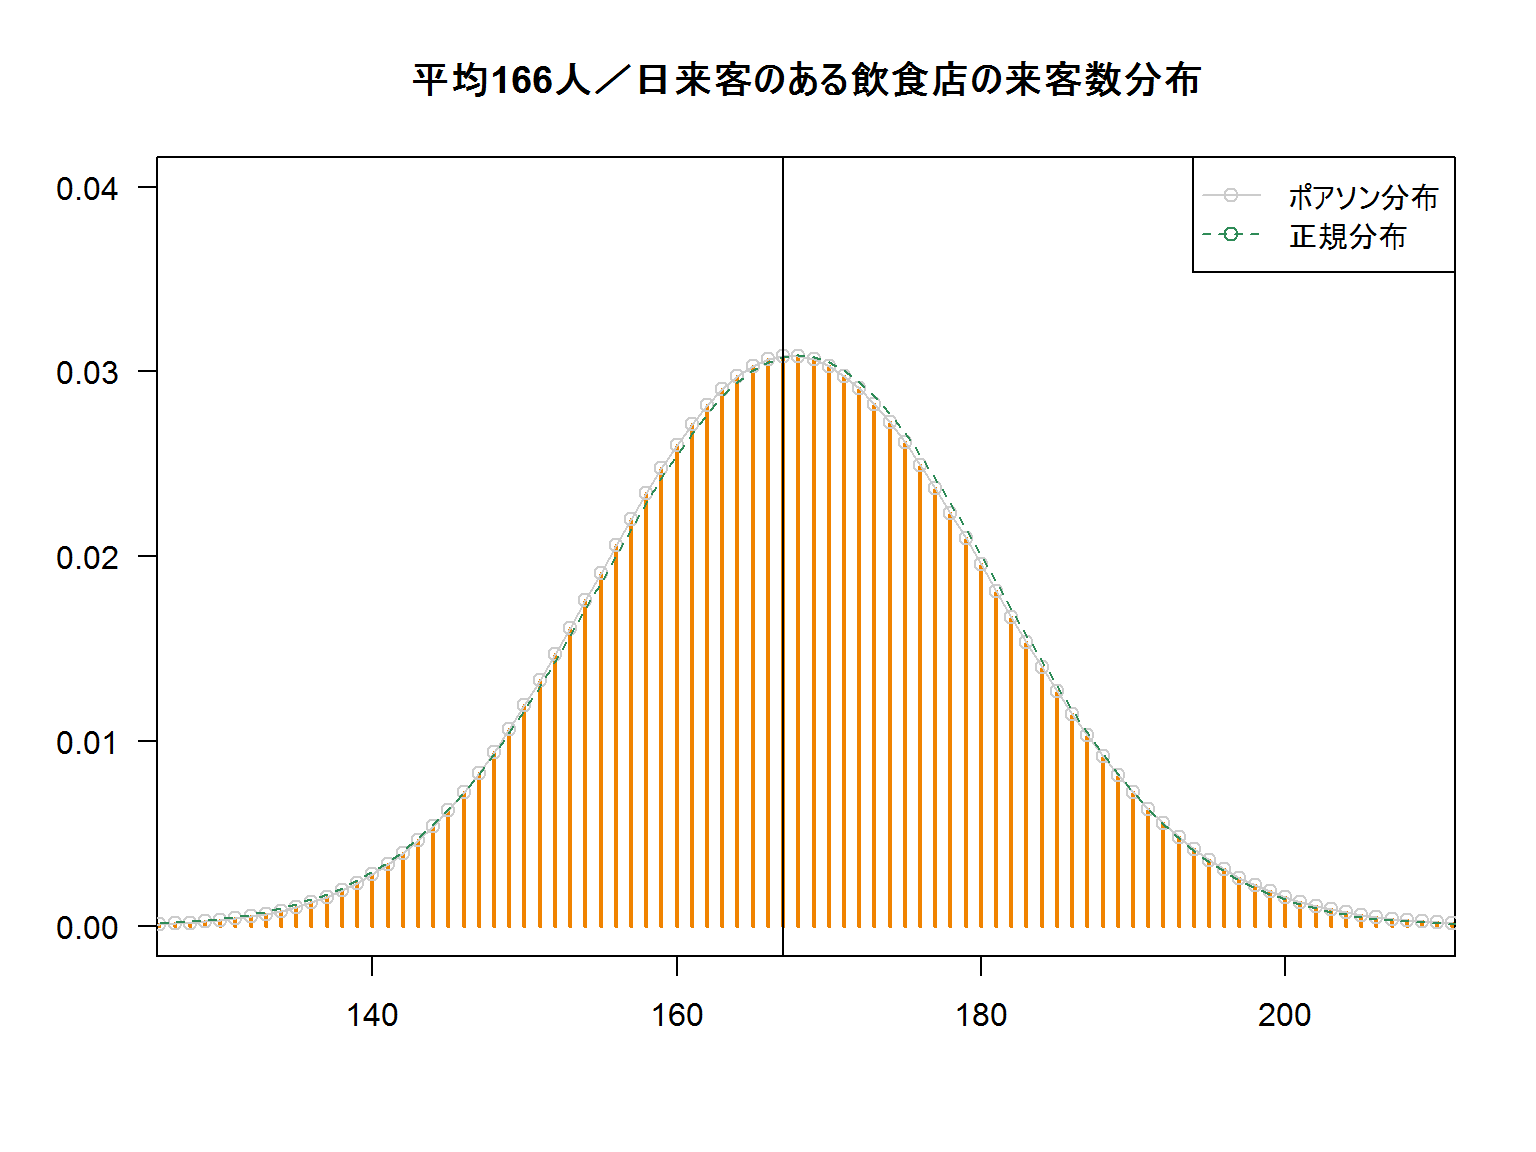 Poisson_distribution_5